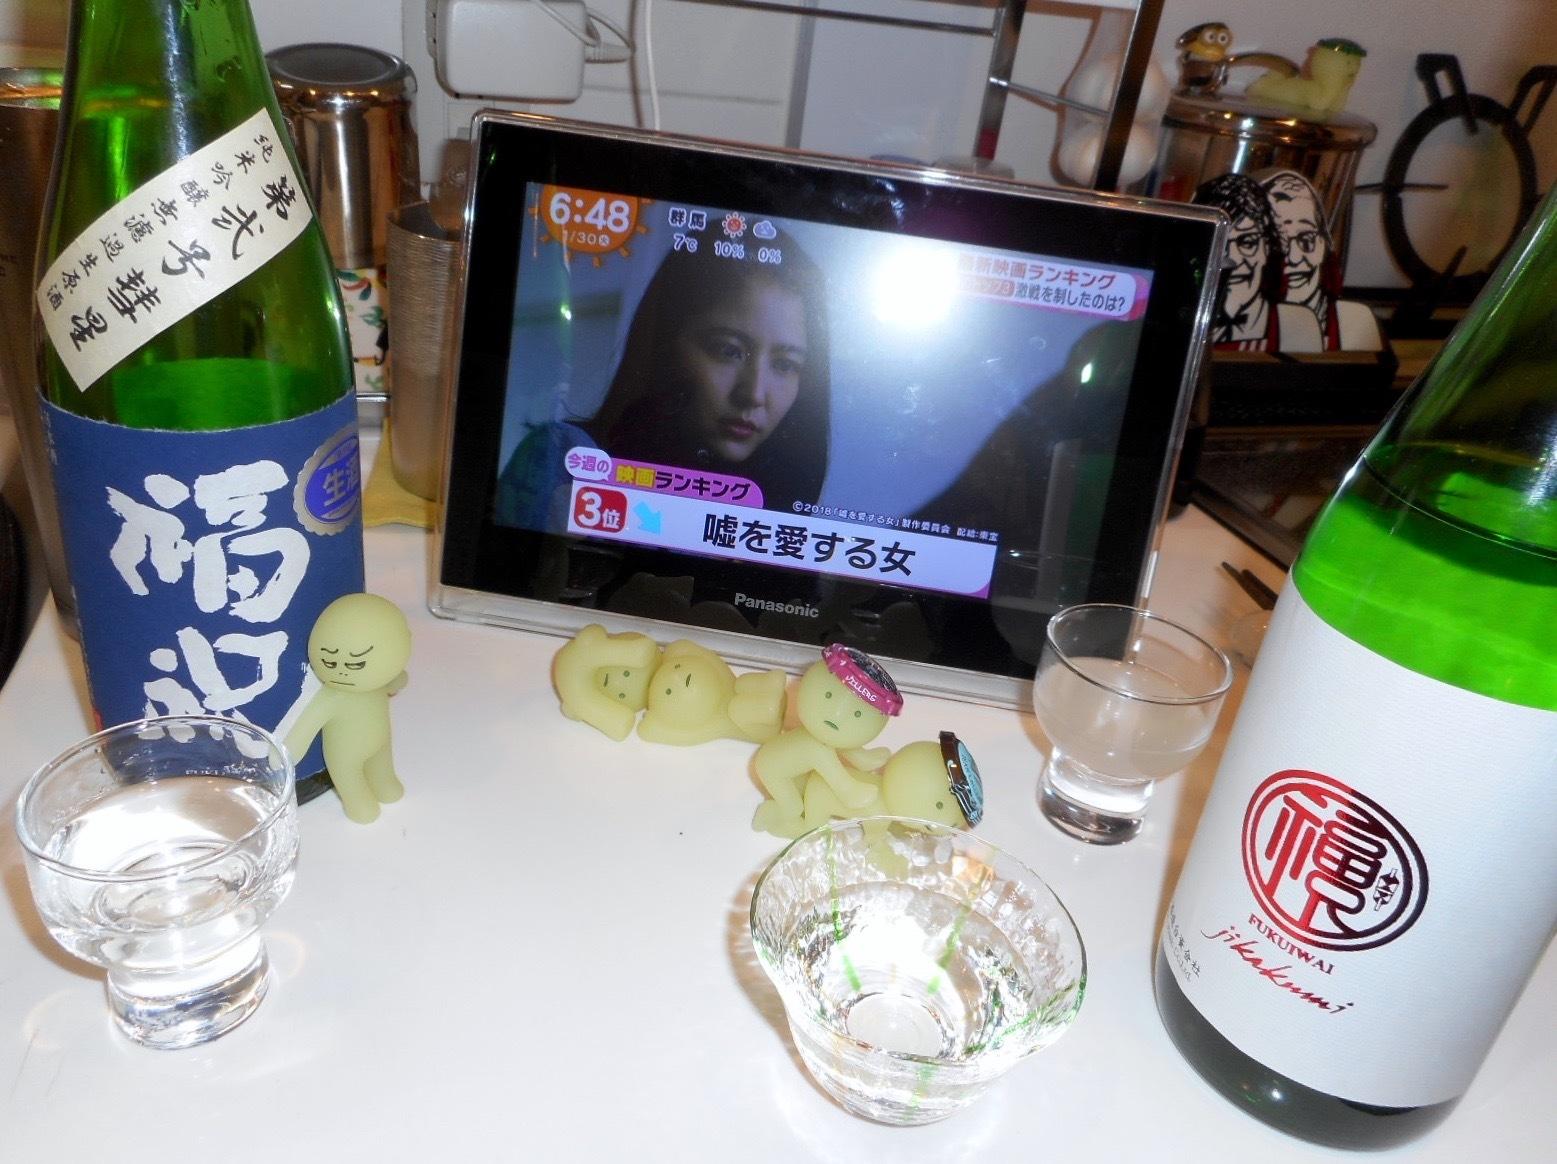 fukuiwai_yamada50jikagumi29by4.jpg